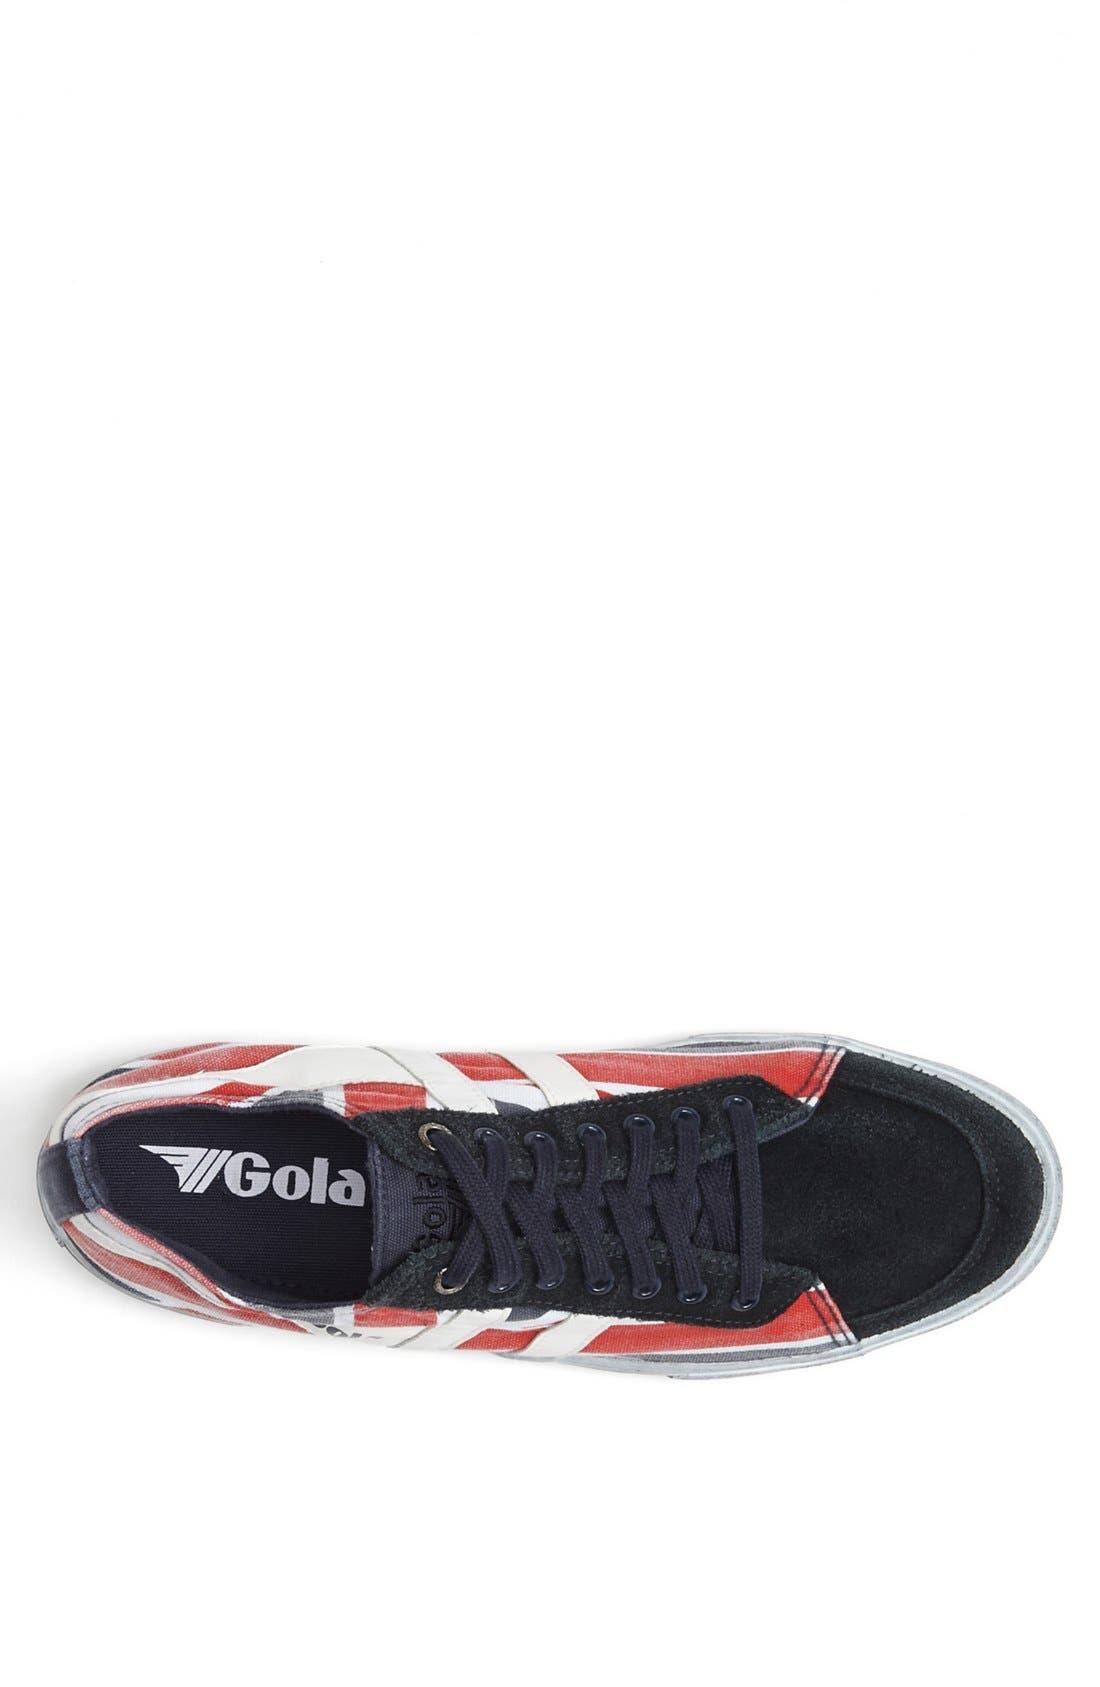 Alternate Image 3  - Gola 'Quota - Union Jack' Sneaker (Men)